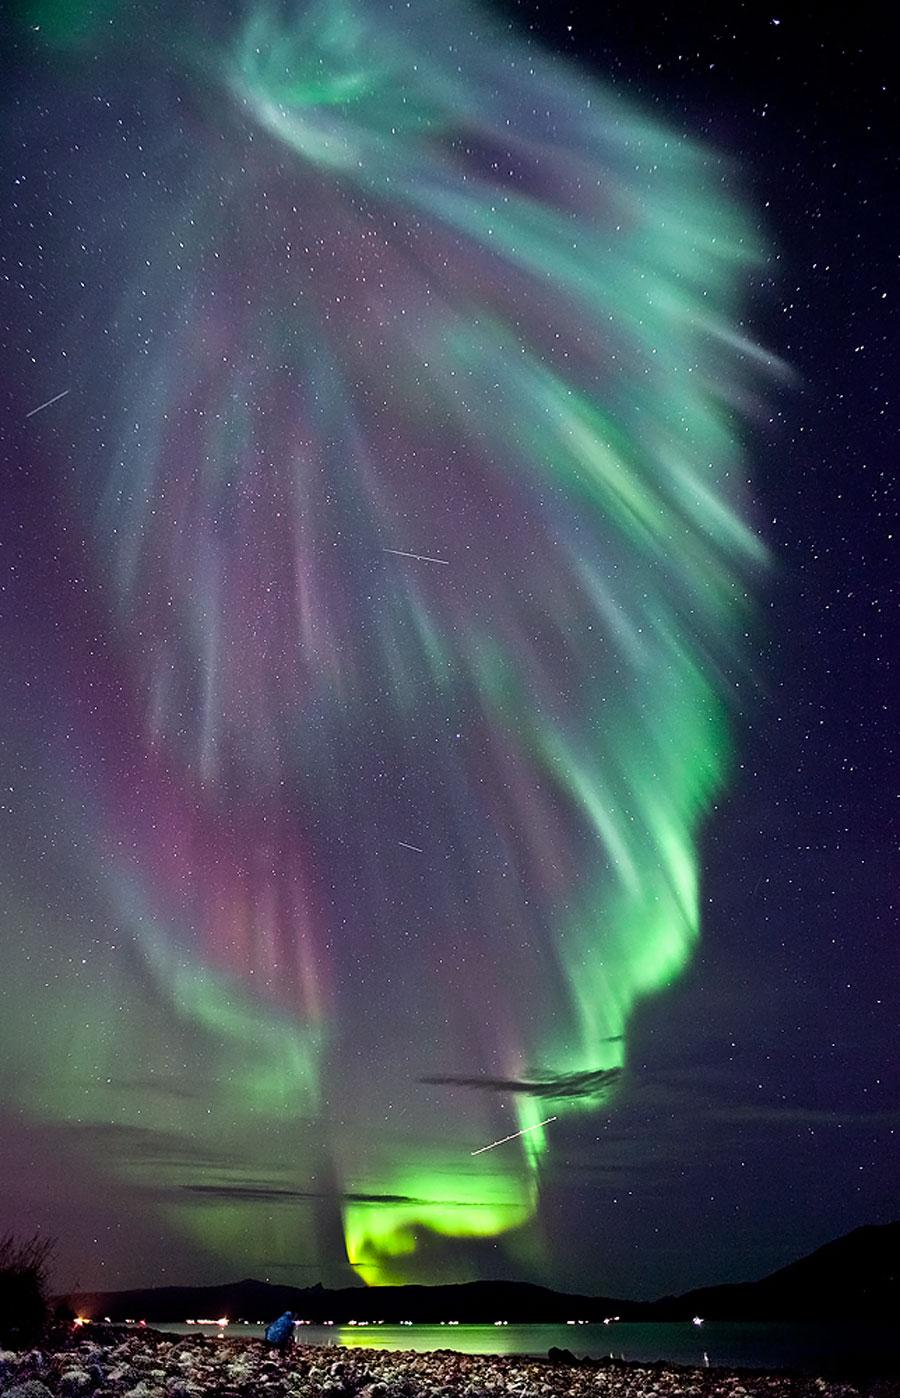 http://antwrp.gsfc.nasa.gov/apod/image/1009/aurora_salomonsen.jpg